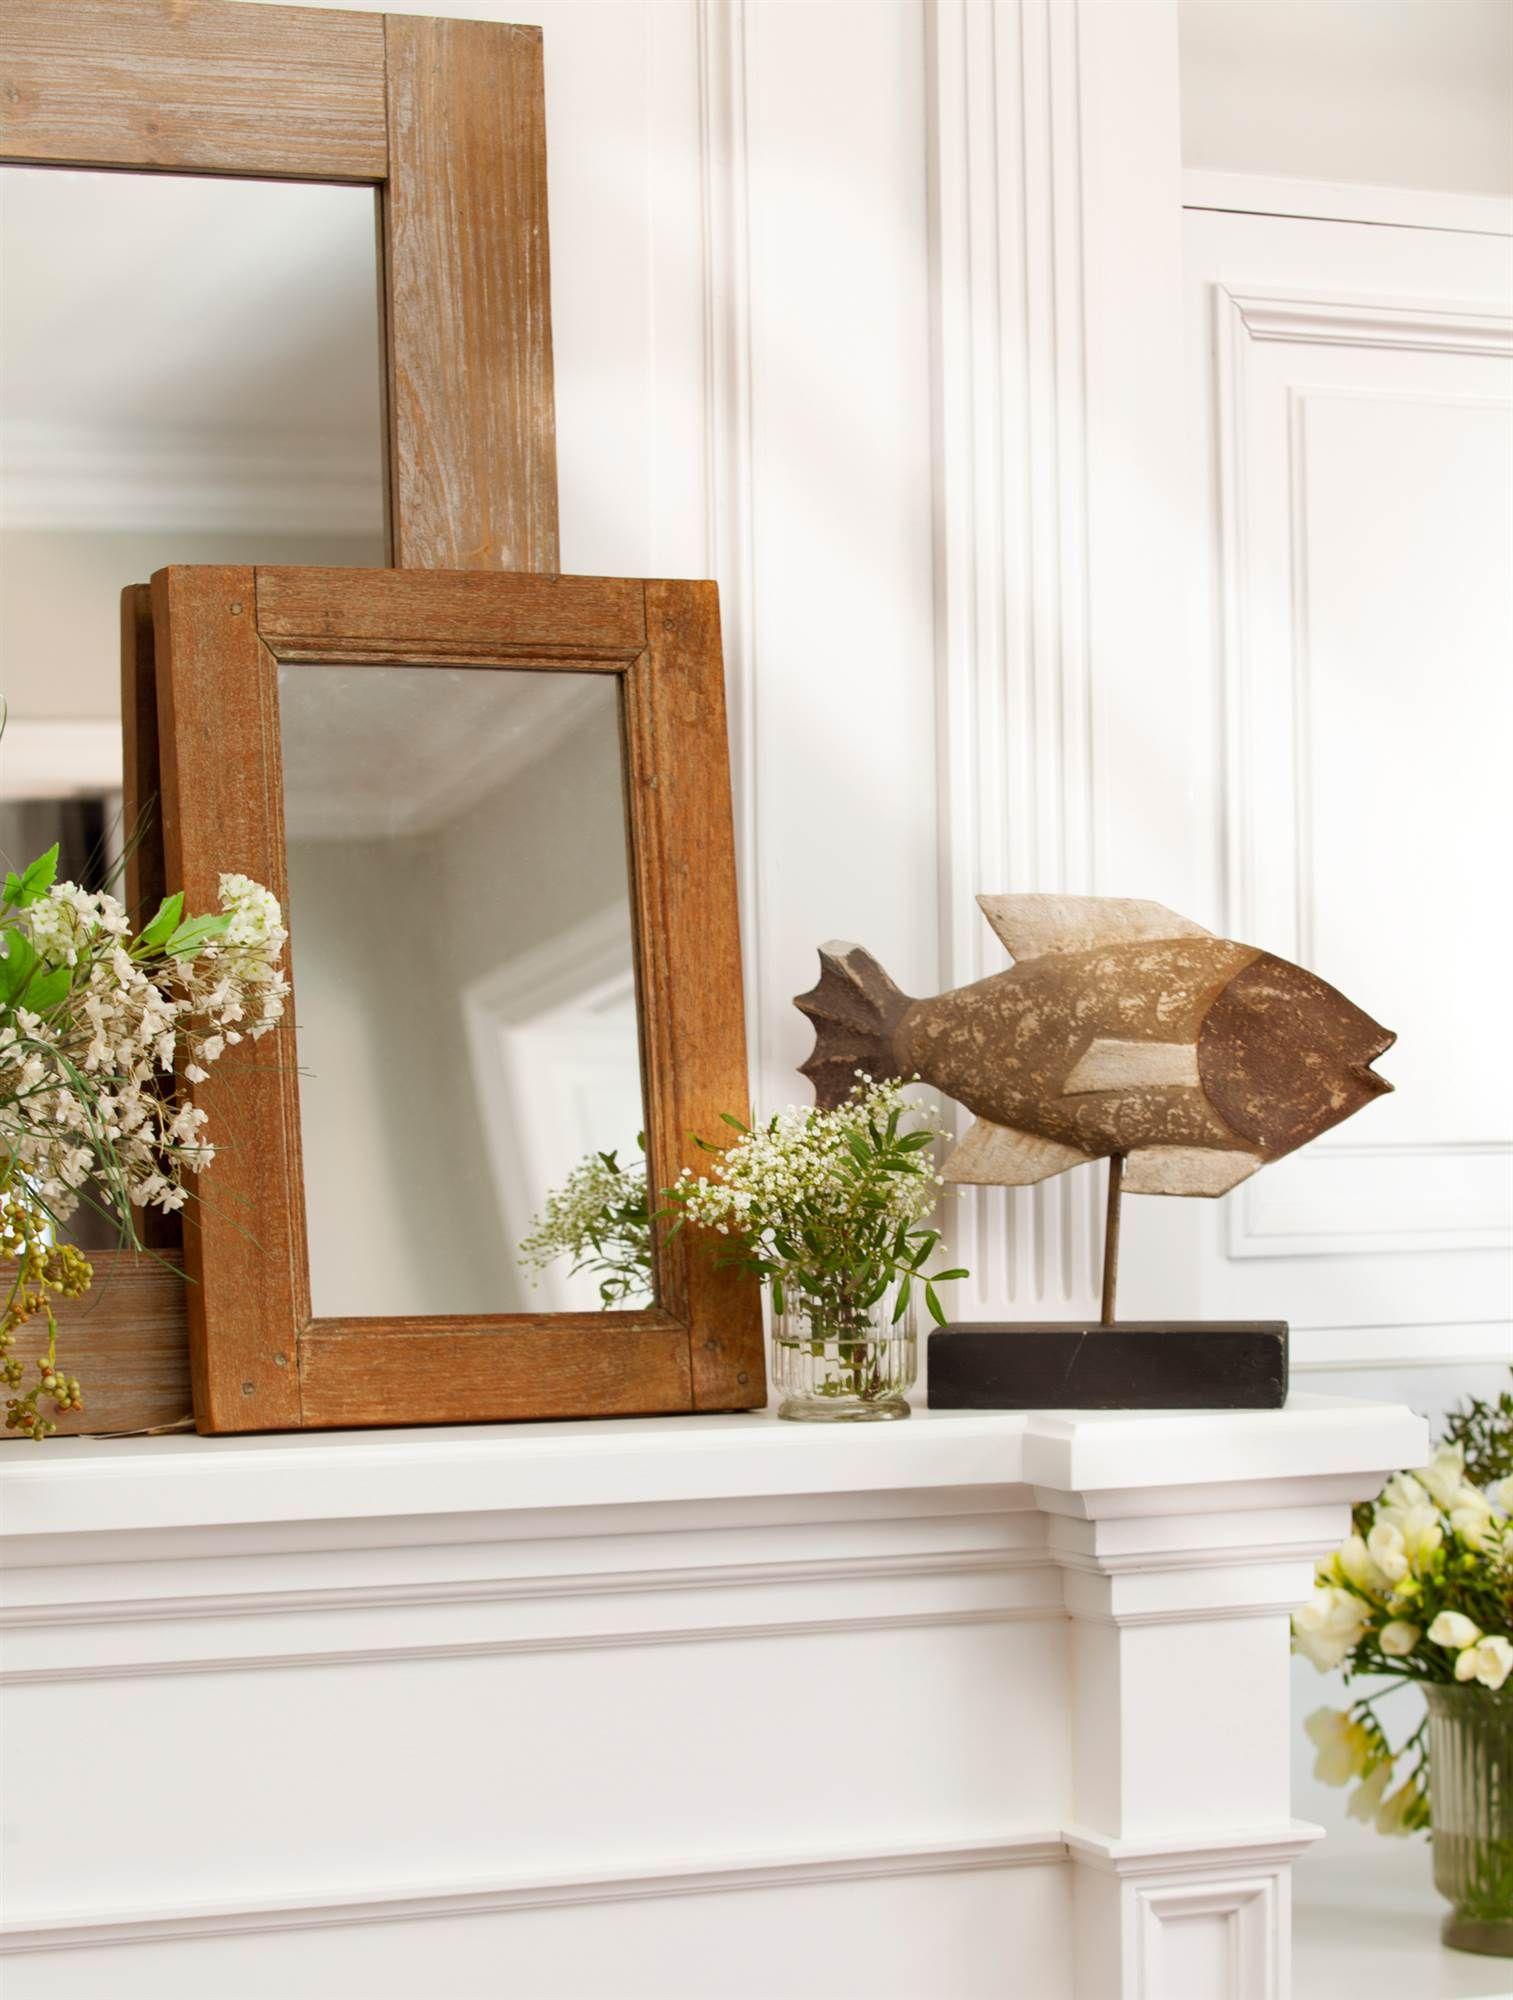 Detalle de espejos de dos tama os con marco de madera for Espejos decorativos para chimeneas